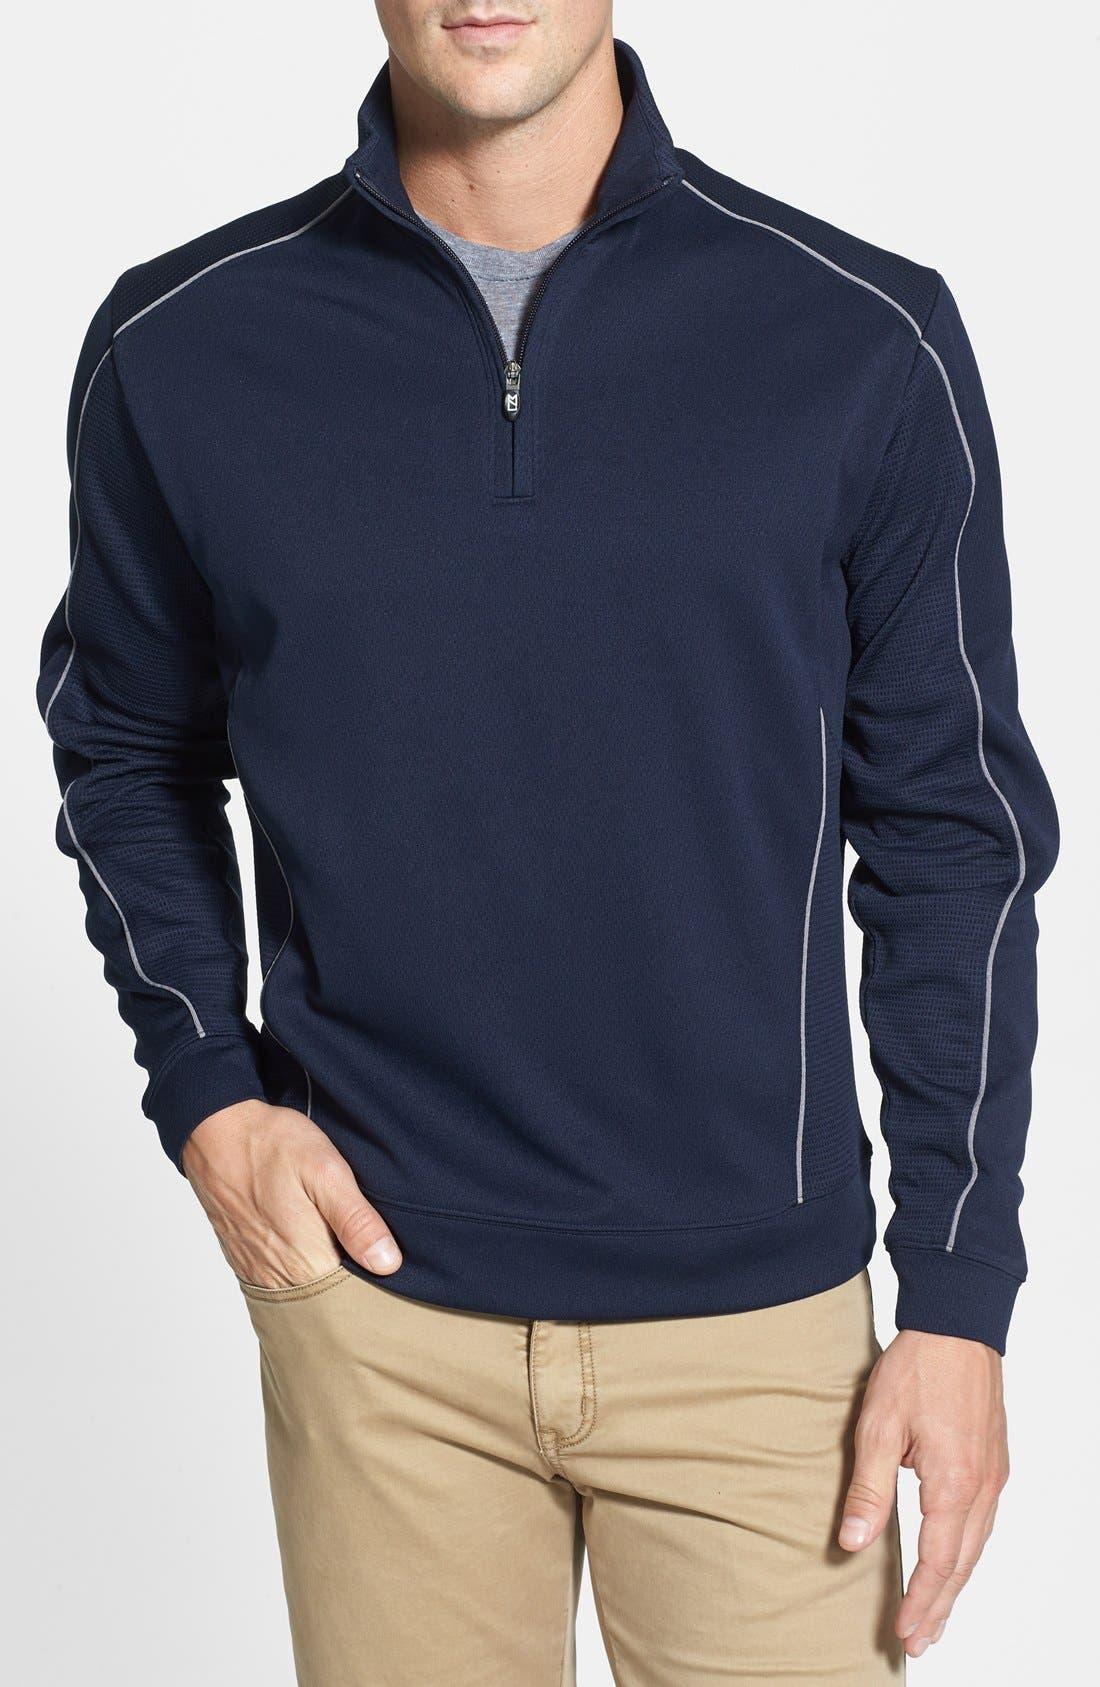 Main Image - Cutter & Buck DryTec Half Zip Pullover